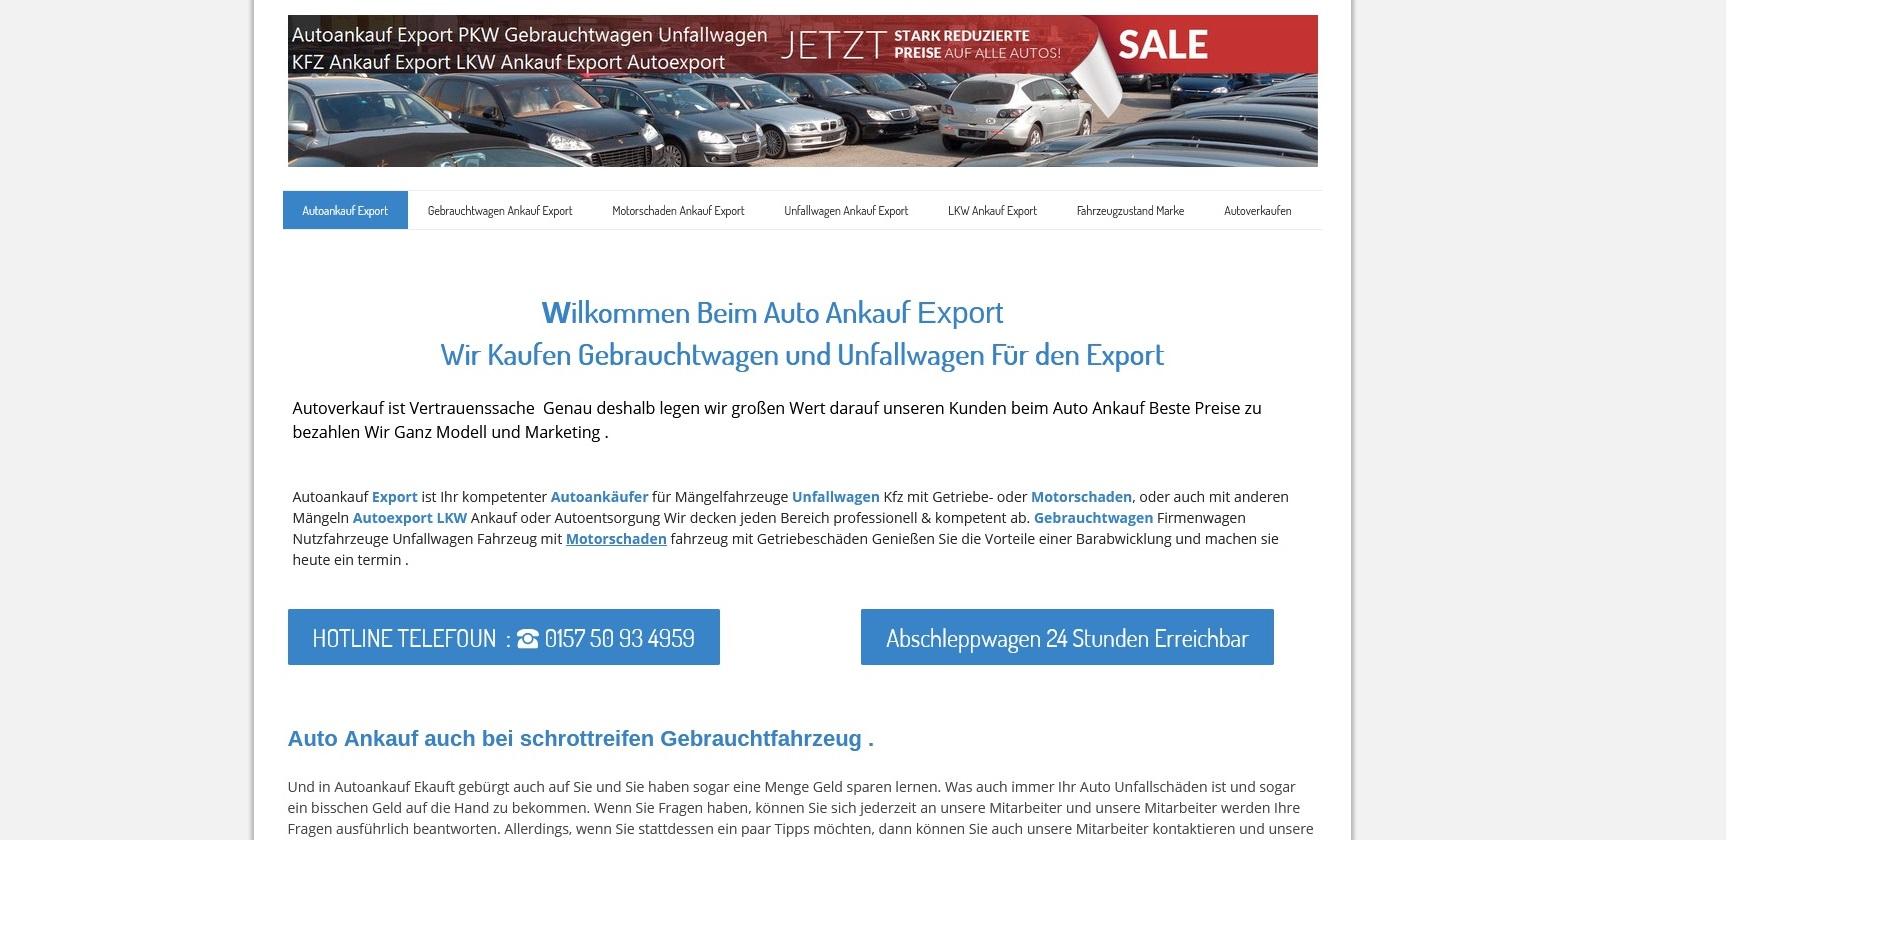 https://www.kfz-ankauf-export.de - Autoankauf Wetzlar